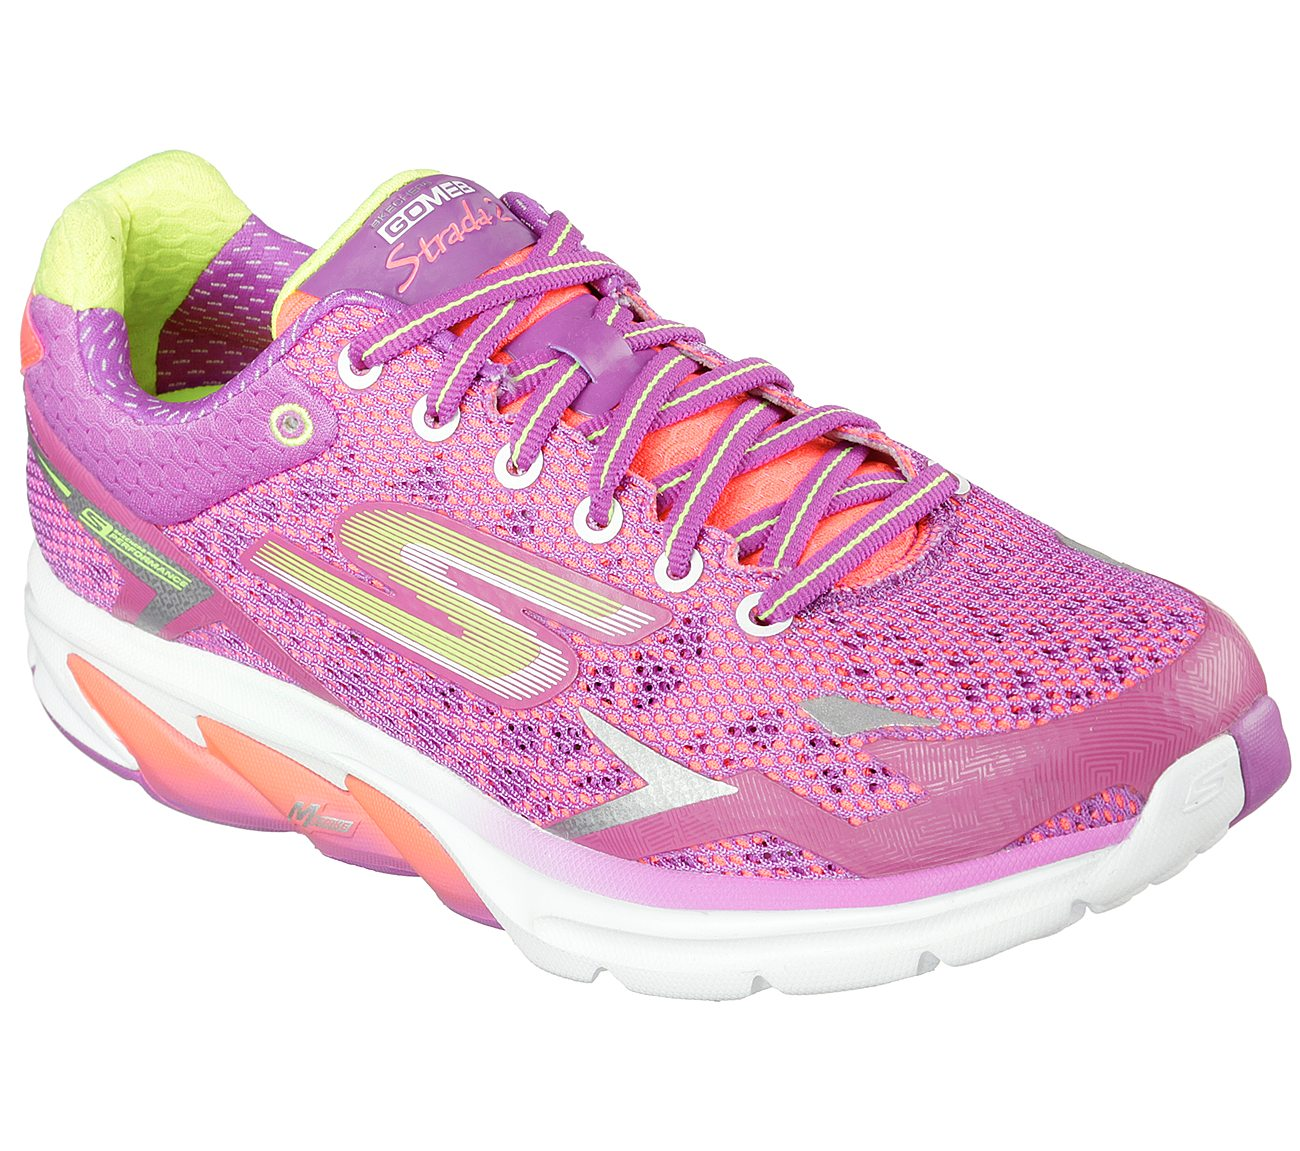 New Women's Skechers 14115 GOMeb Strada 2 Running Shoes Size 8.5 (F1)